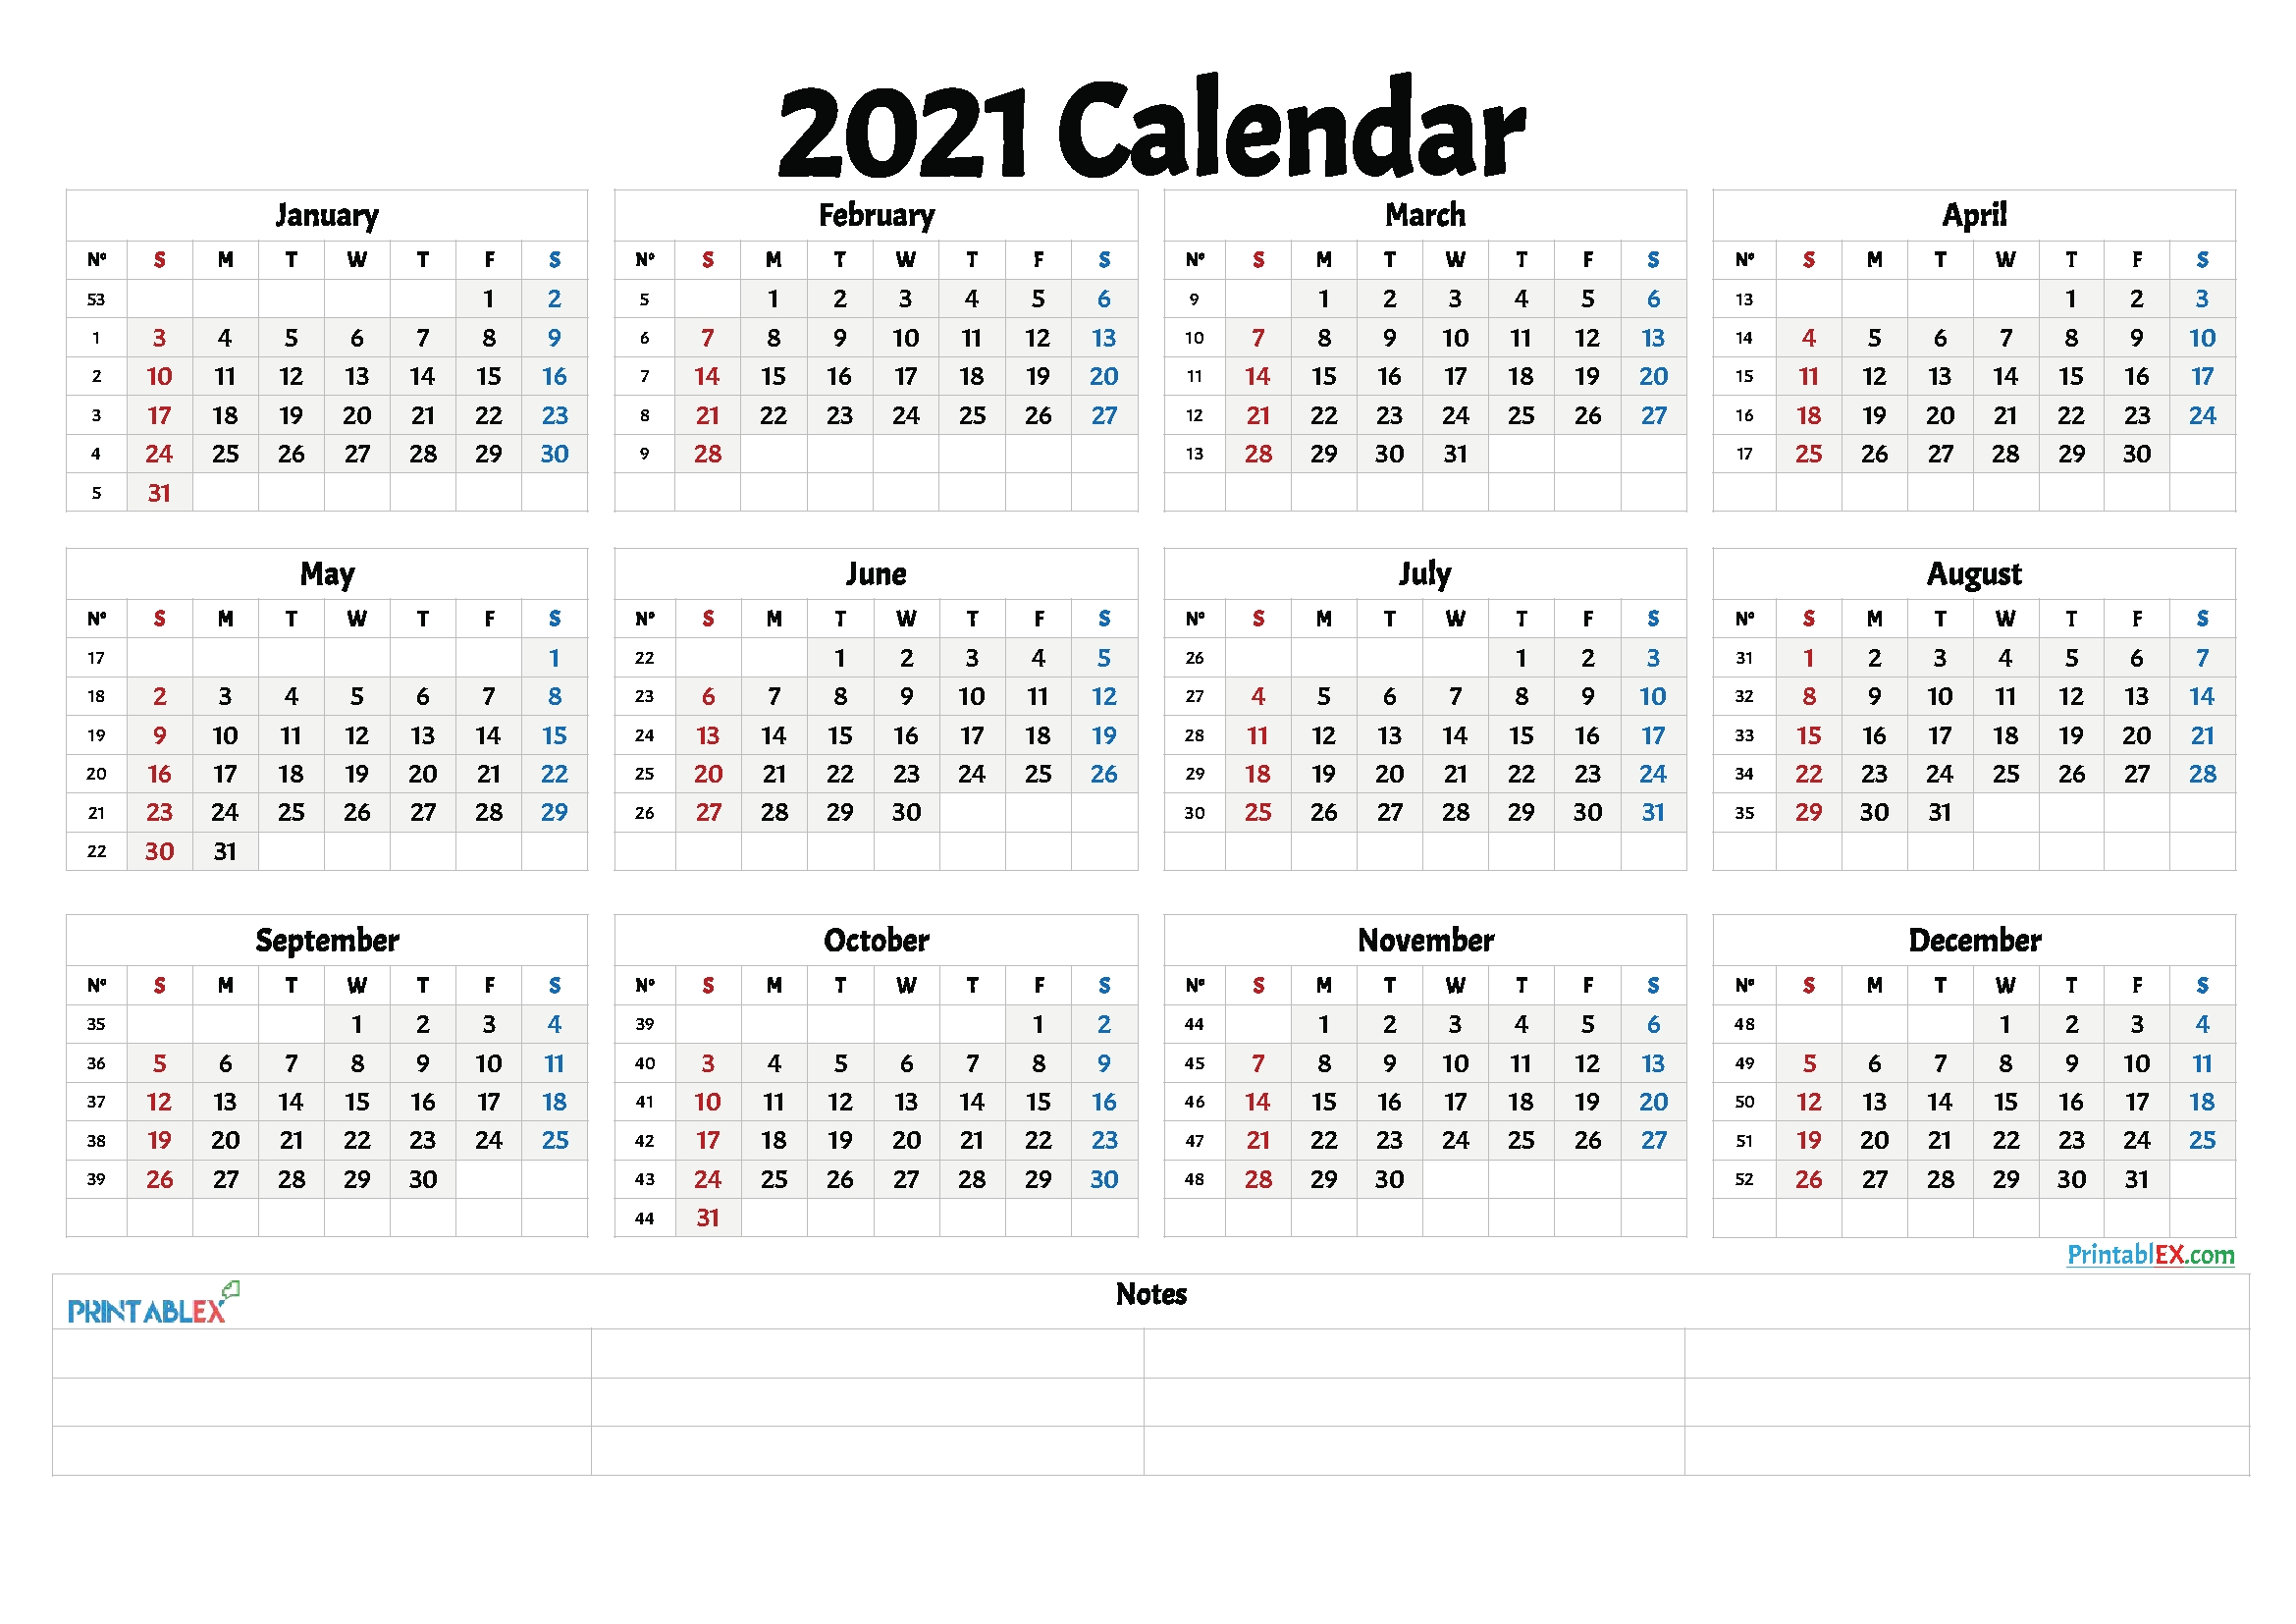 Free Printable 2021 Yearly Calendar With Week Numbers  Free Printable Bill Calendar 2021